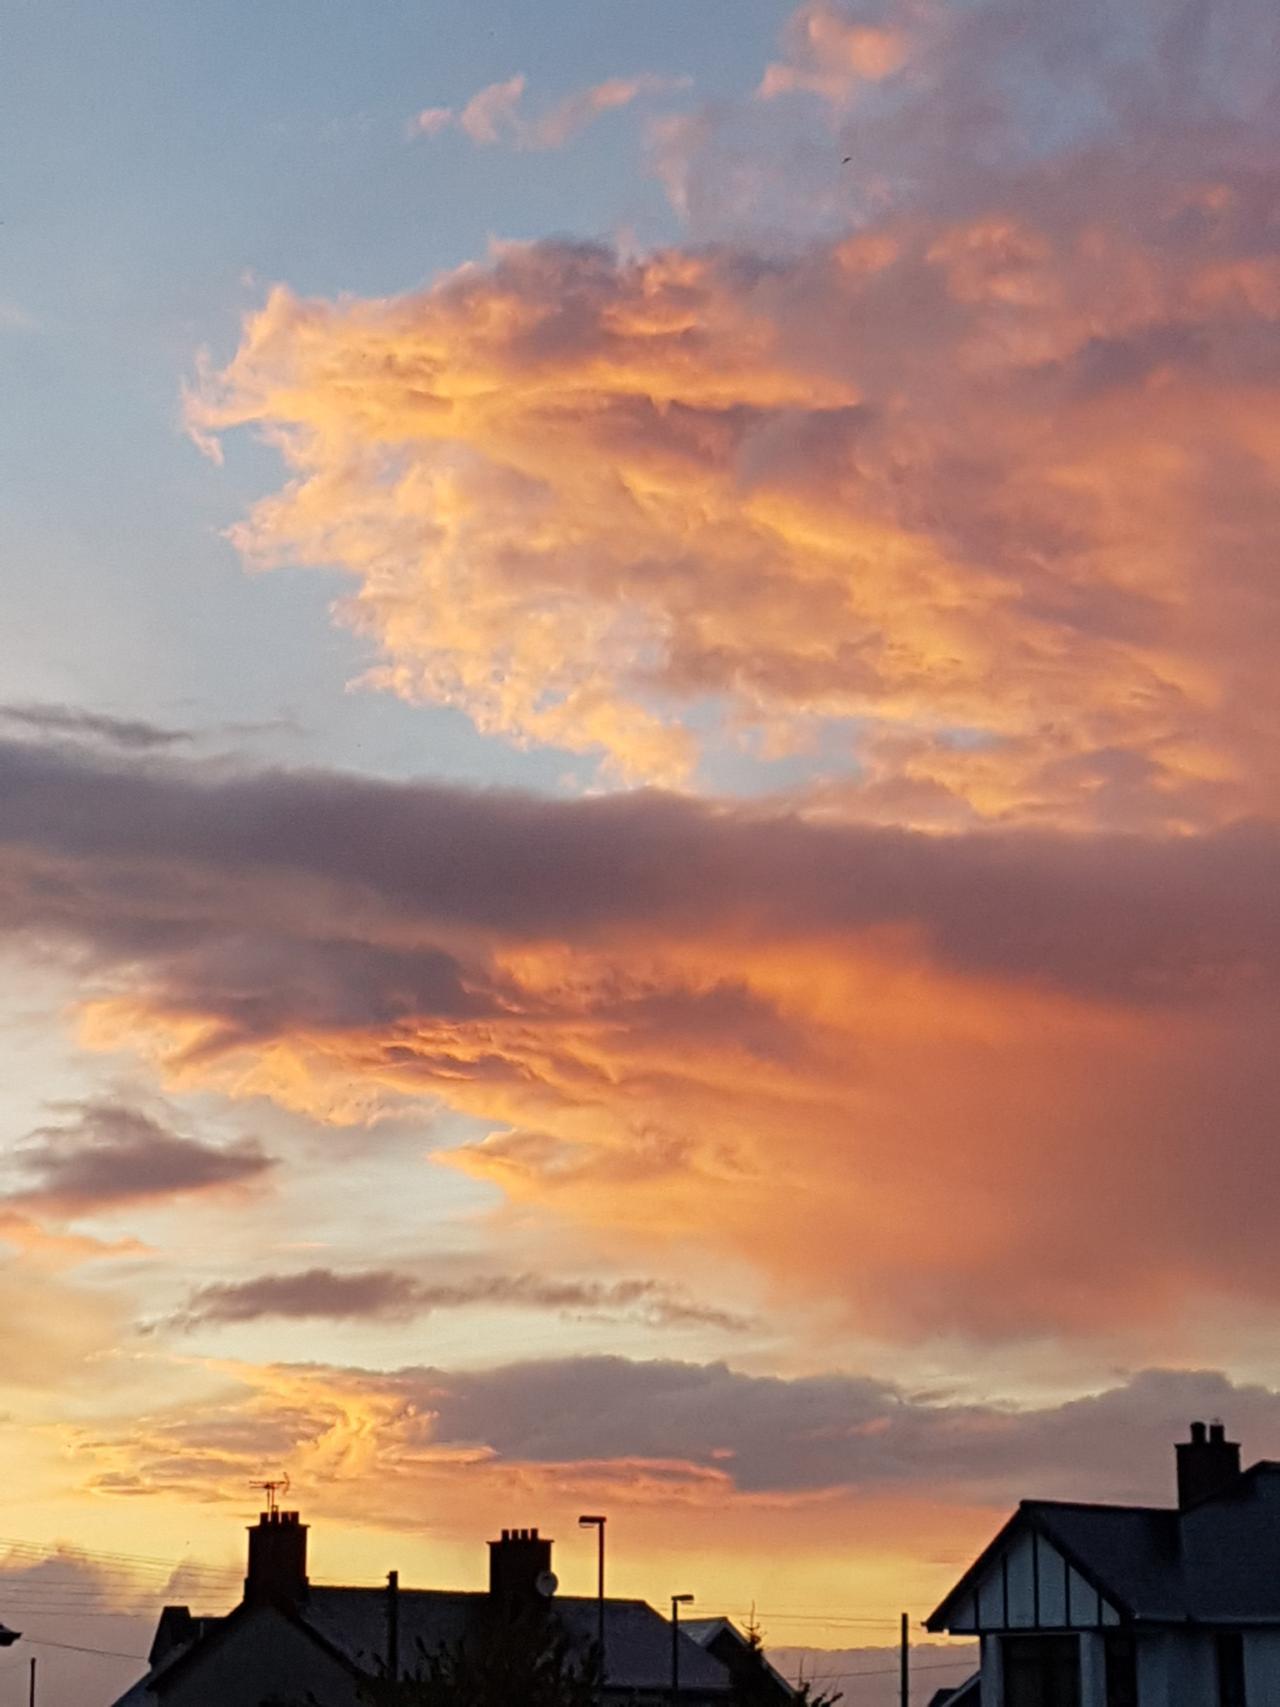 Contrast of light in the sky. - Maeve O'Lynn